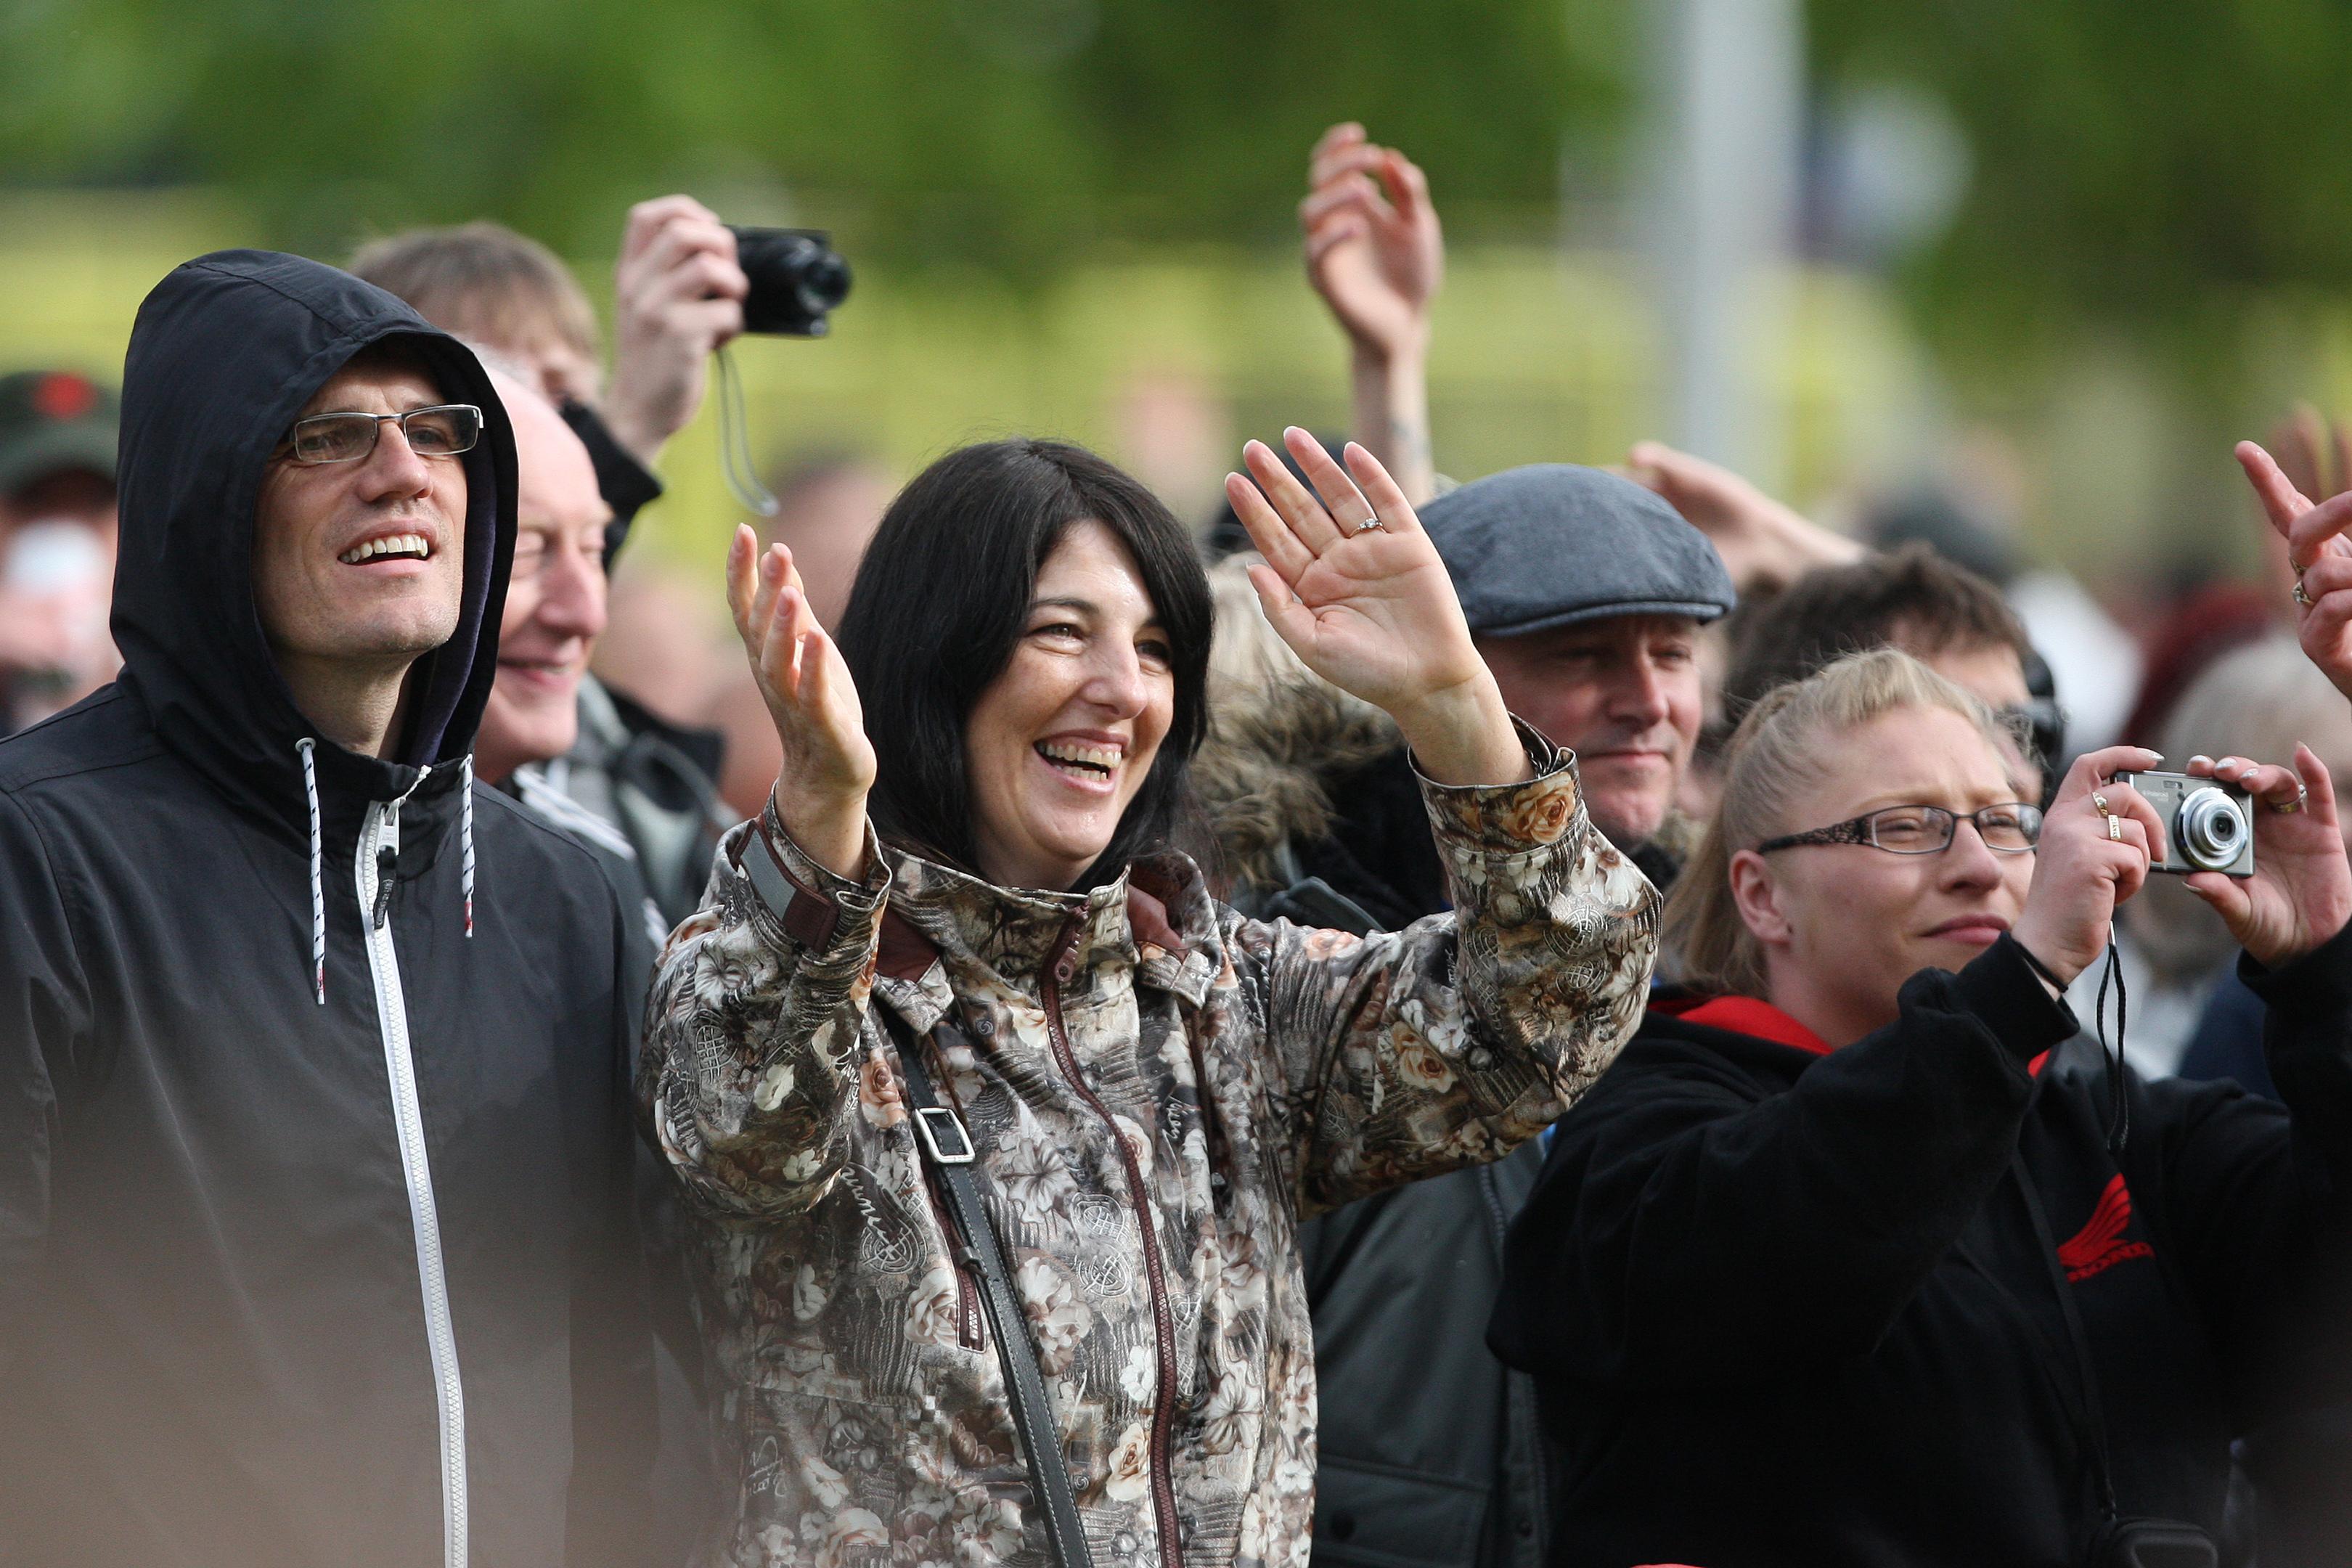 Fans enjoying the show in rain and shine.